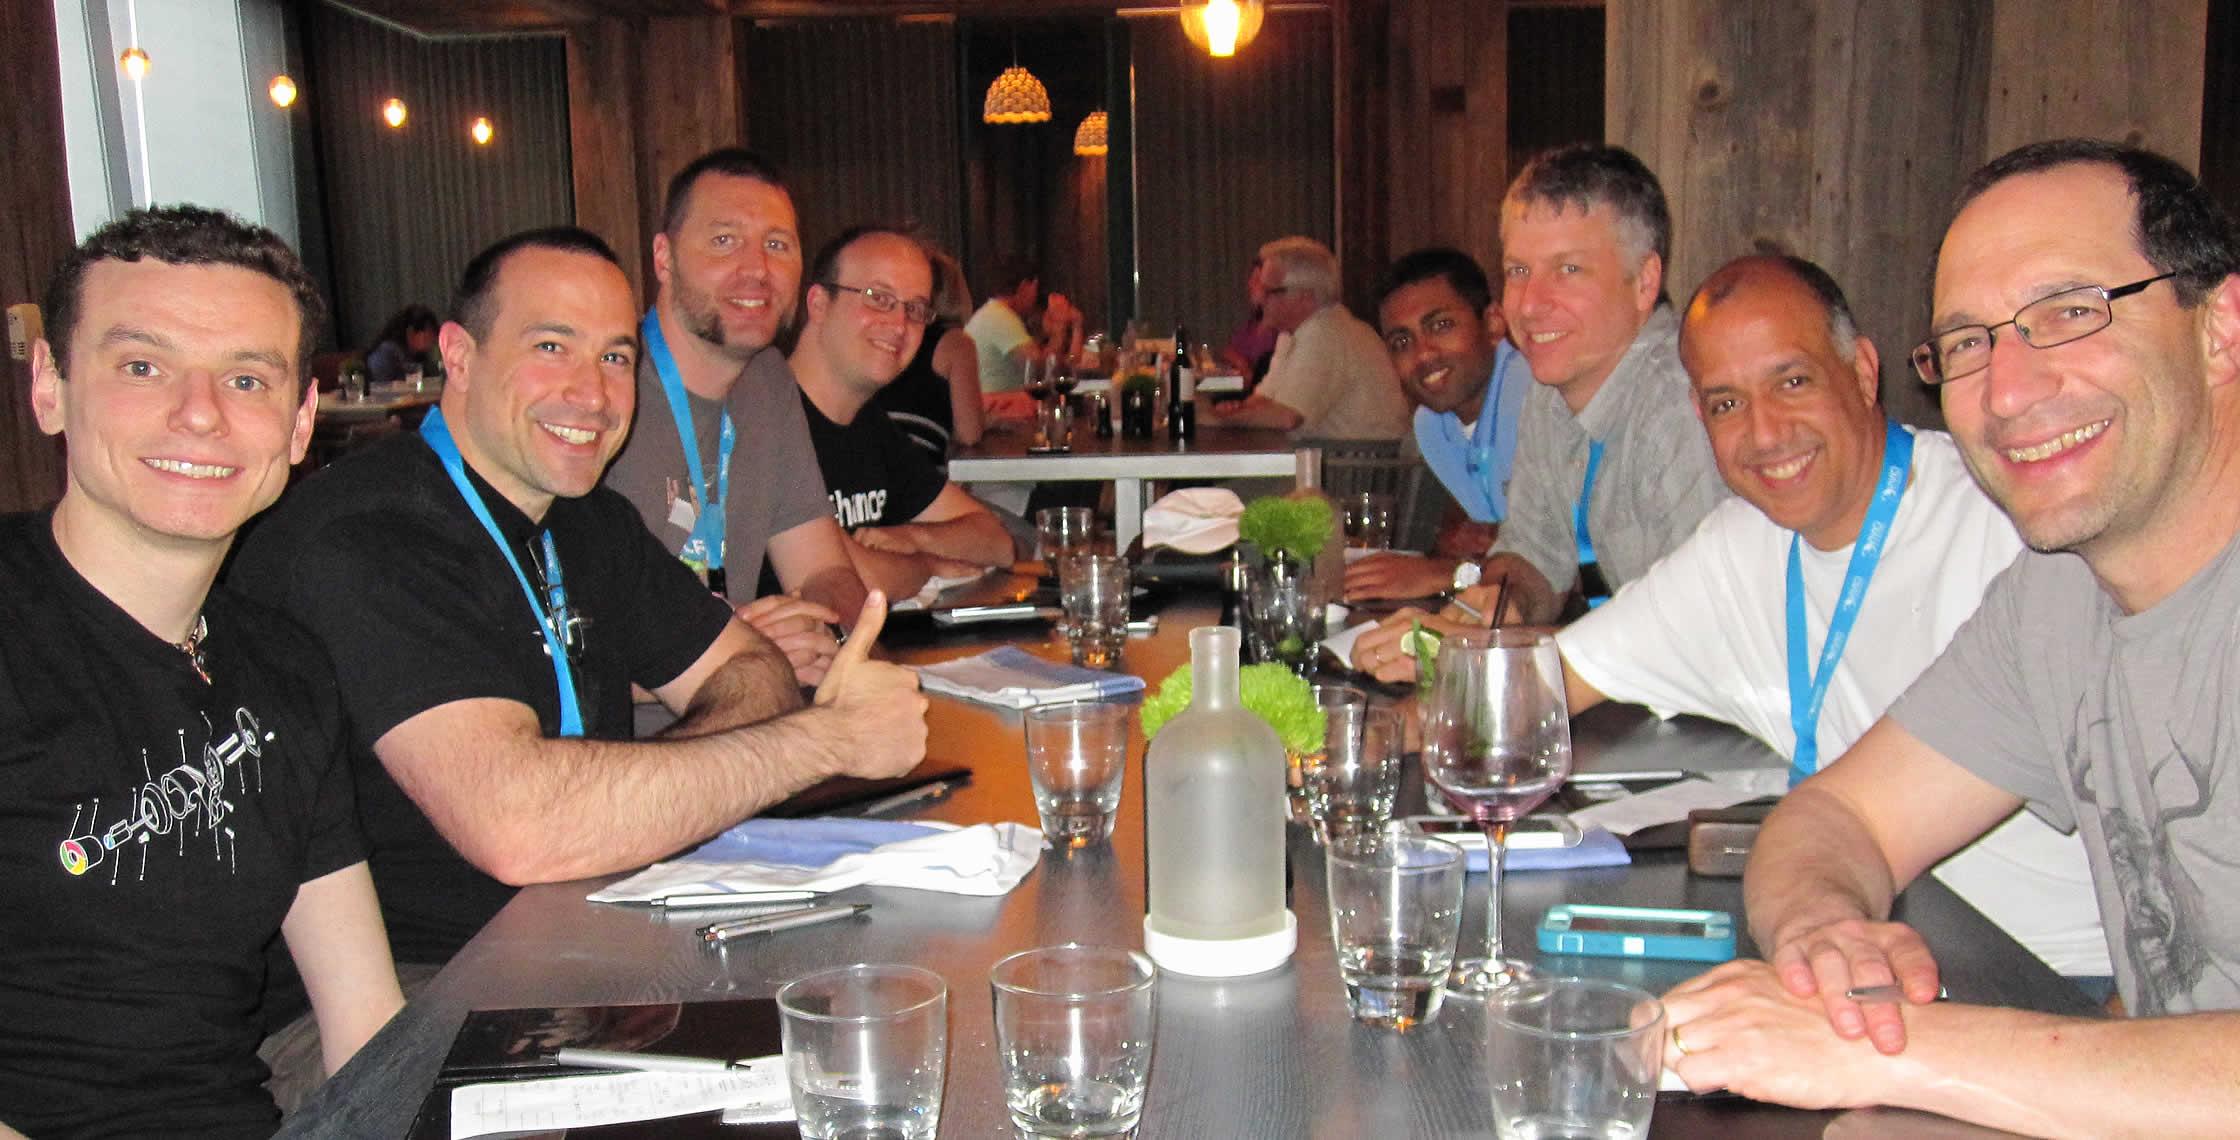 Ben Nadel at cf.Objective() 2013 (Bloomington, MN) with: Elliott Sprehn, Chris Phillips, Nathan Strutz, Anant Pradhan, Dave DeVol, Byron Raines, and Gerry Gurevich